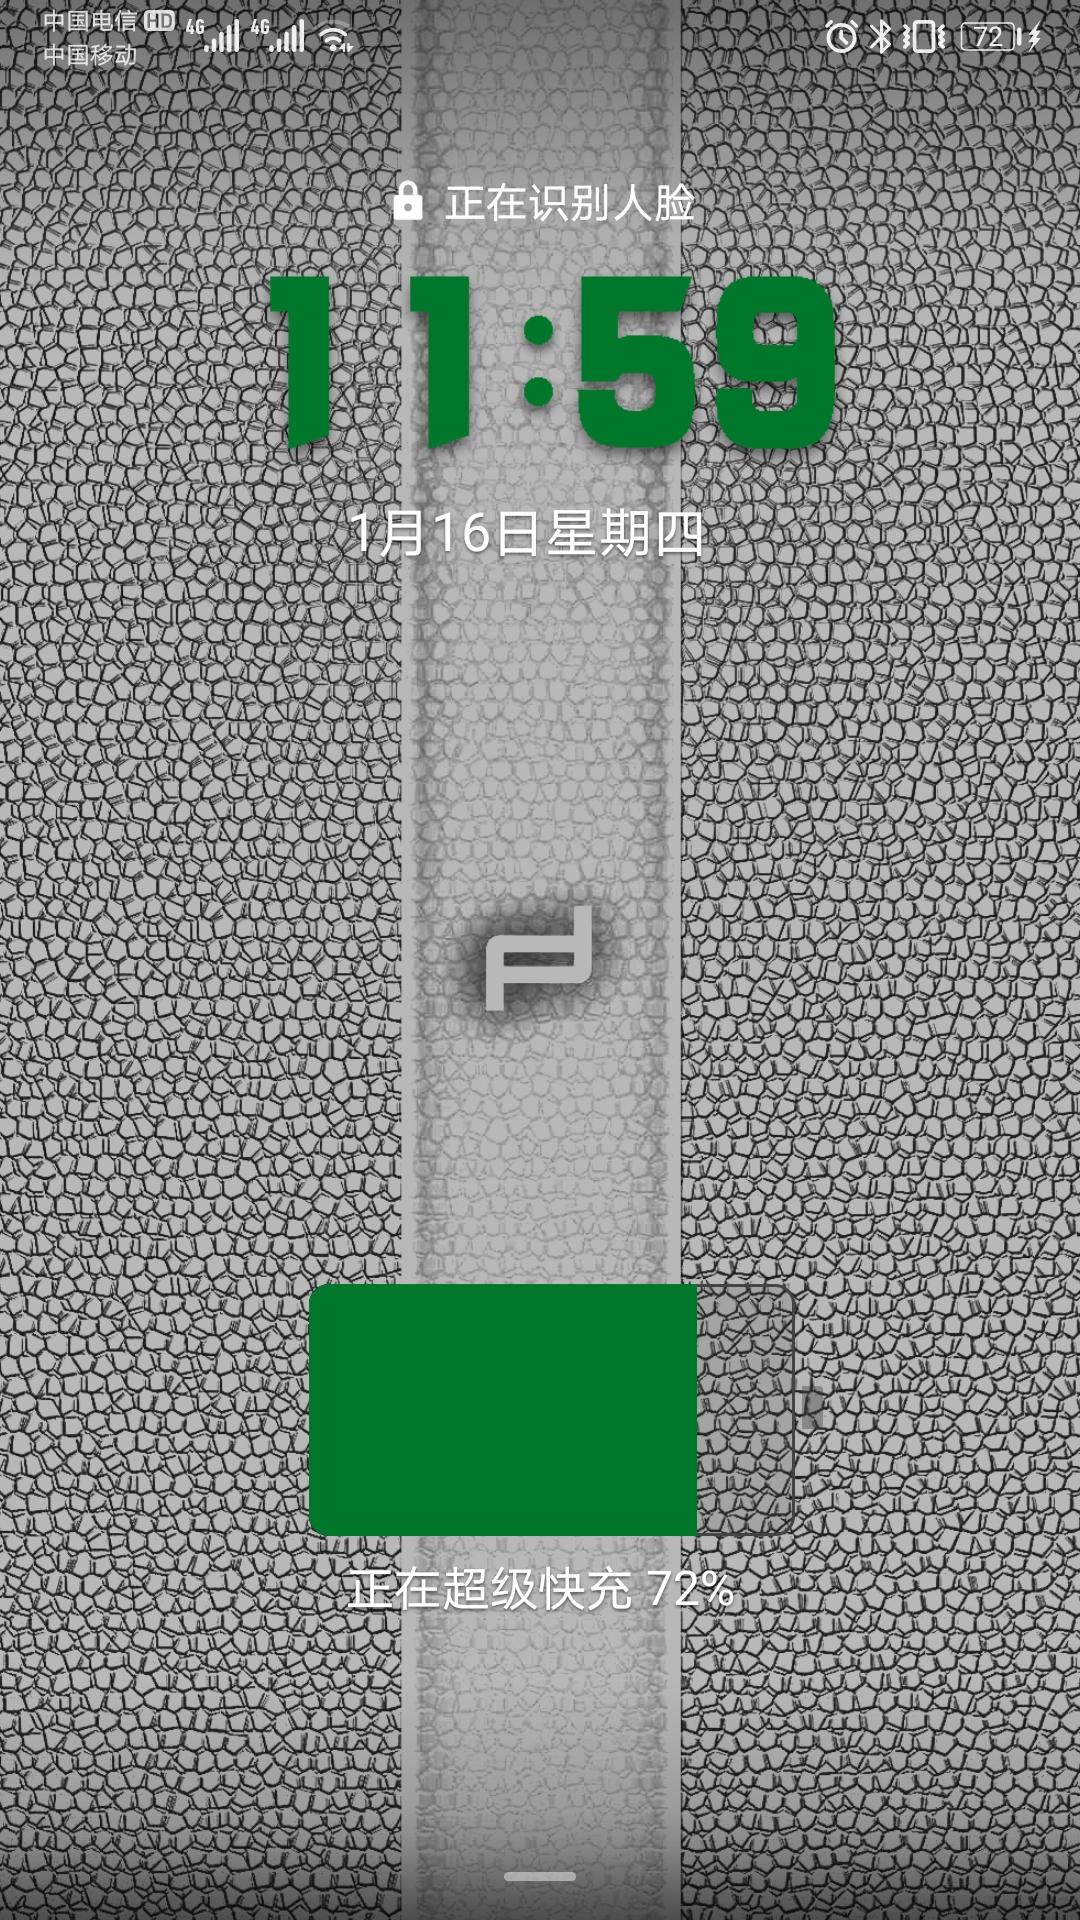 Screenshot_20200116_115921_com.android.keyguard.jpg